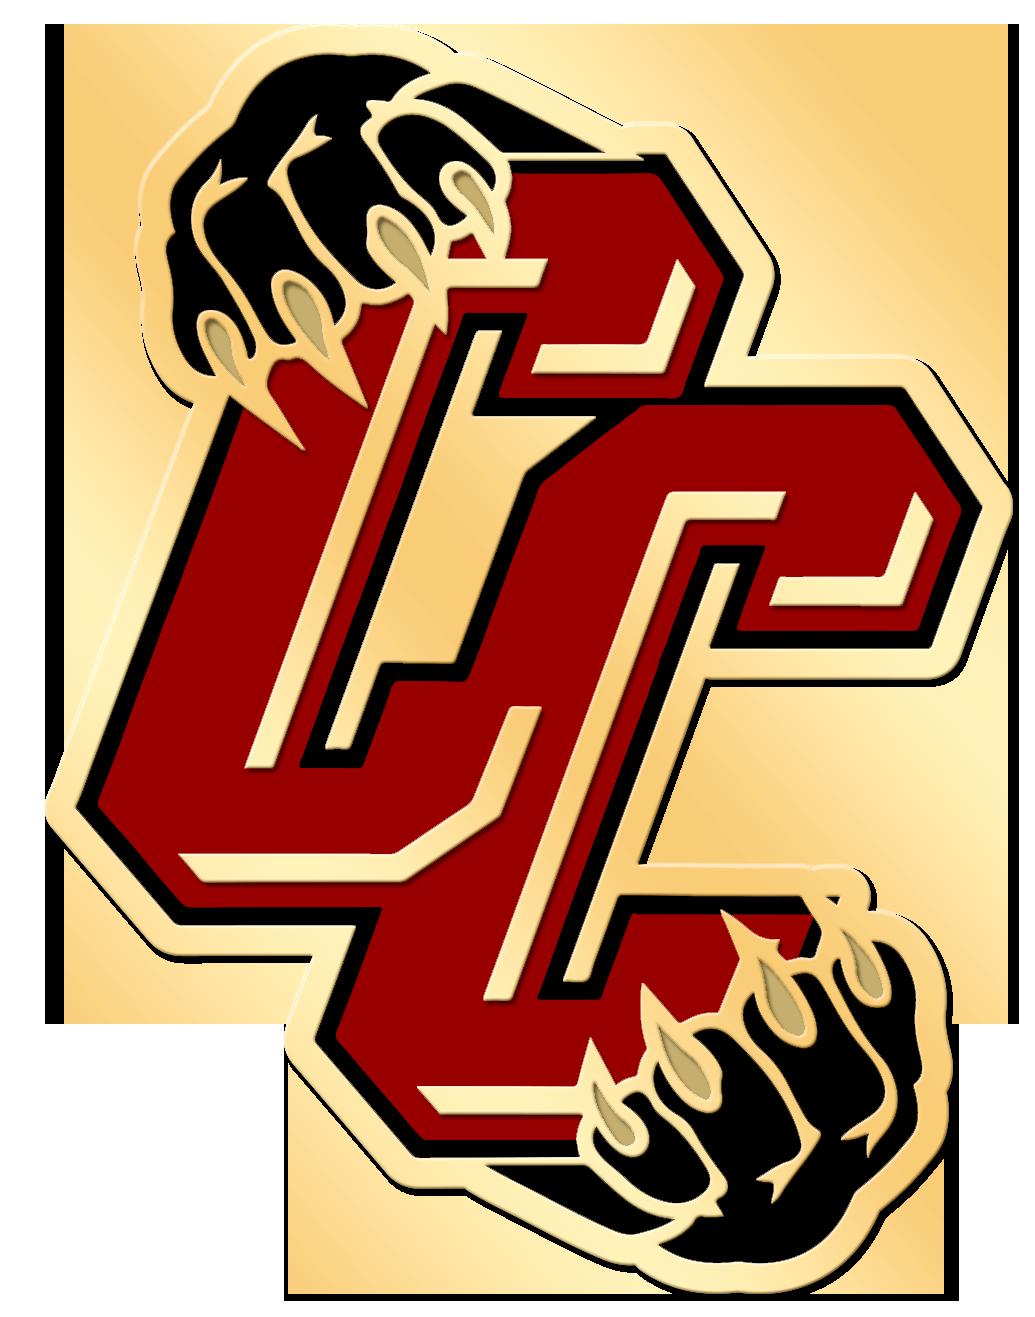 school sports teams logo pins.png